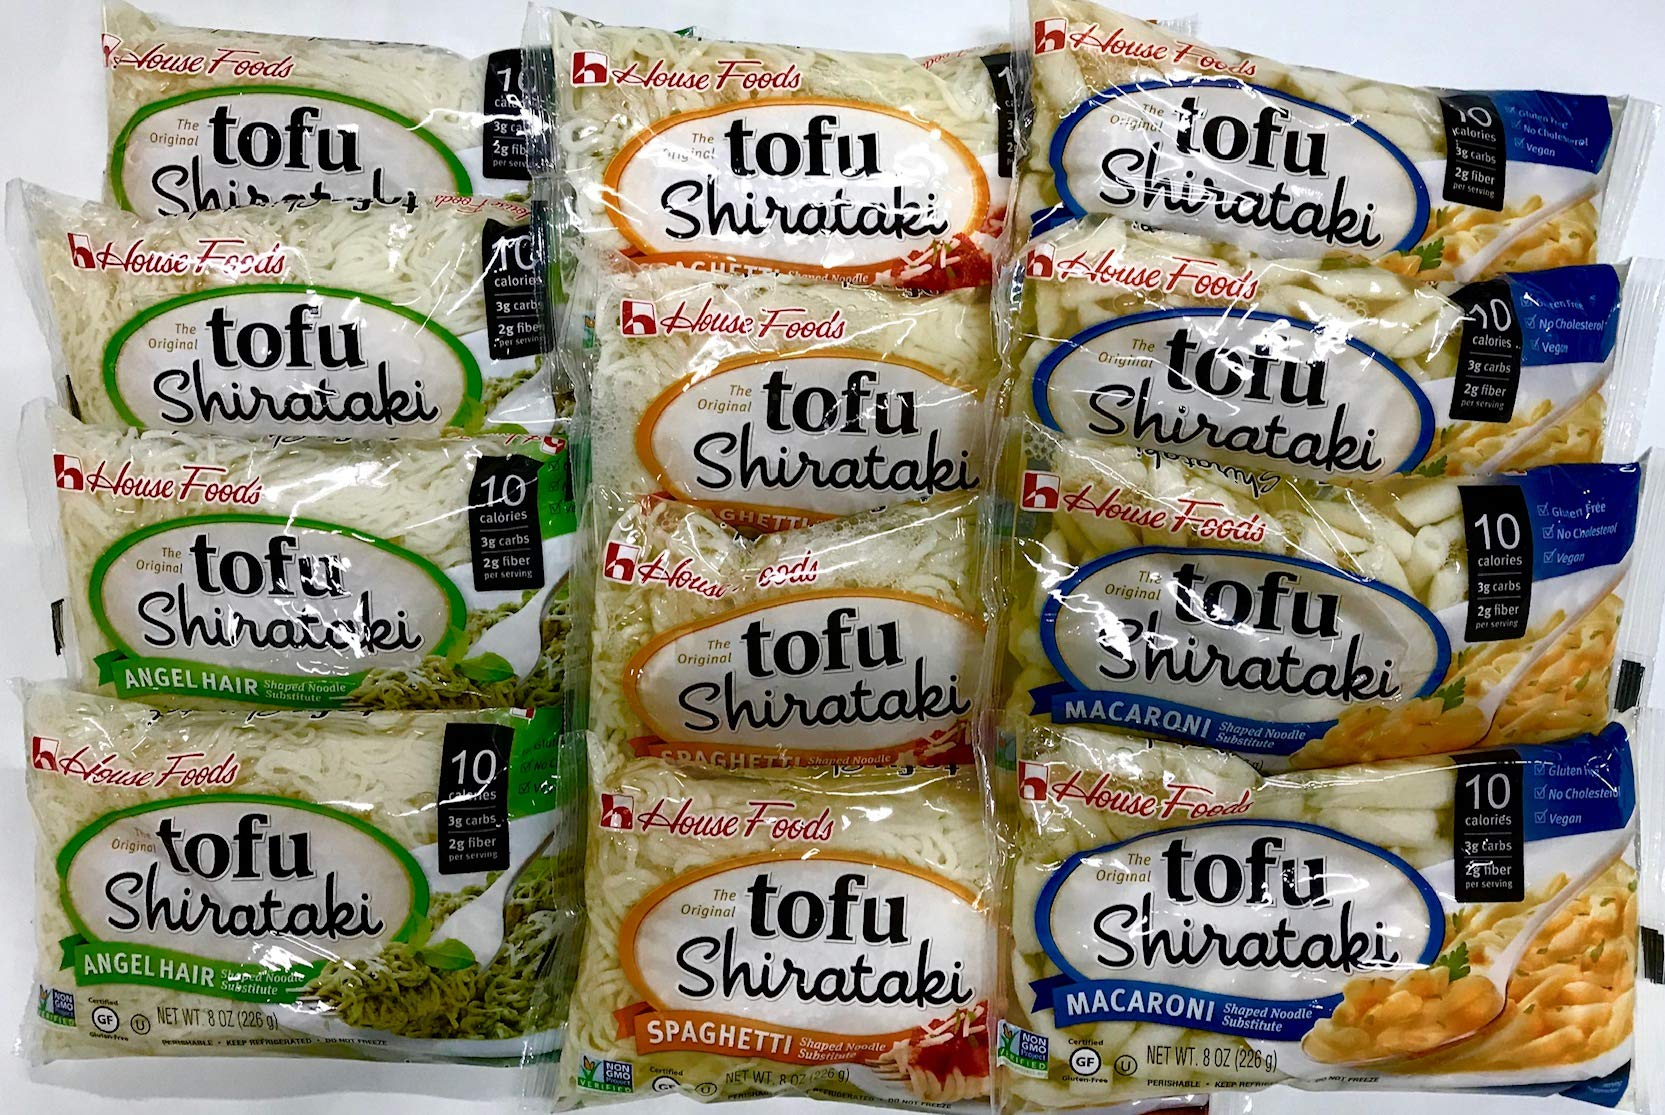 House Foods - 12 Bag Variety Pack Tofu Shirataki Noodles